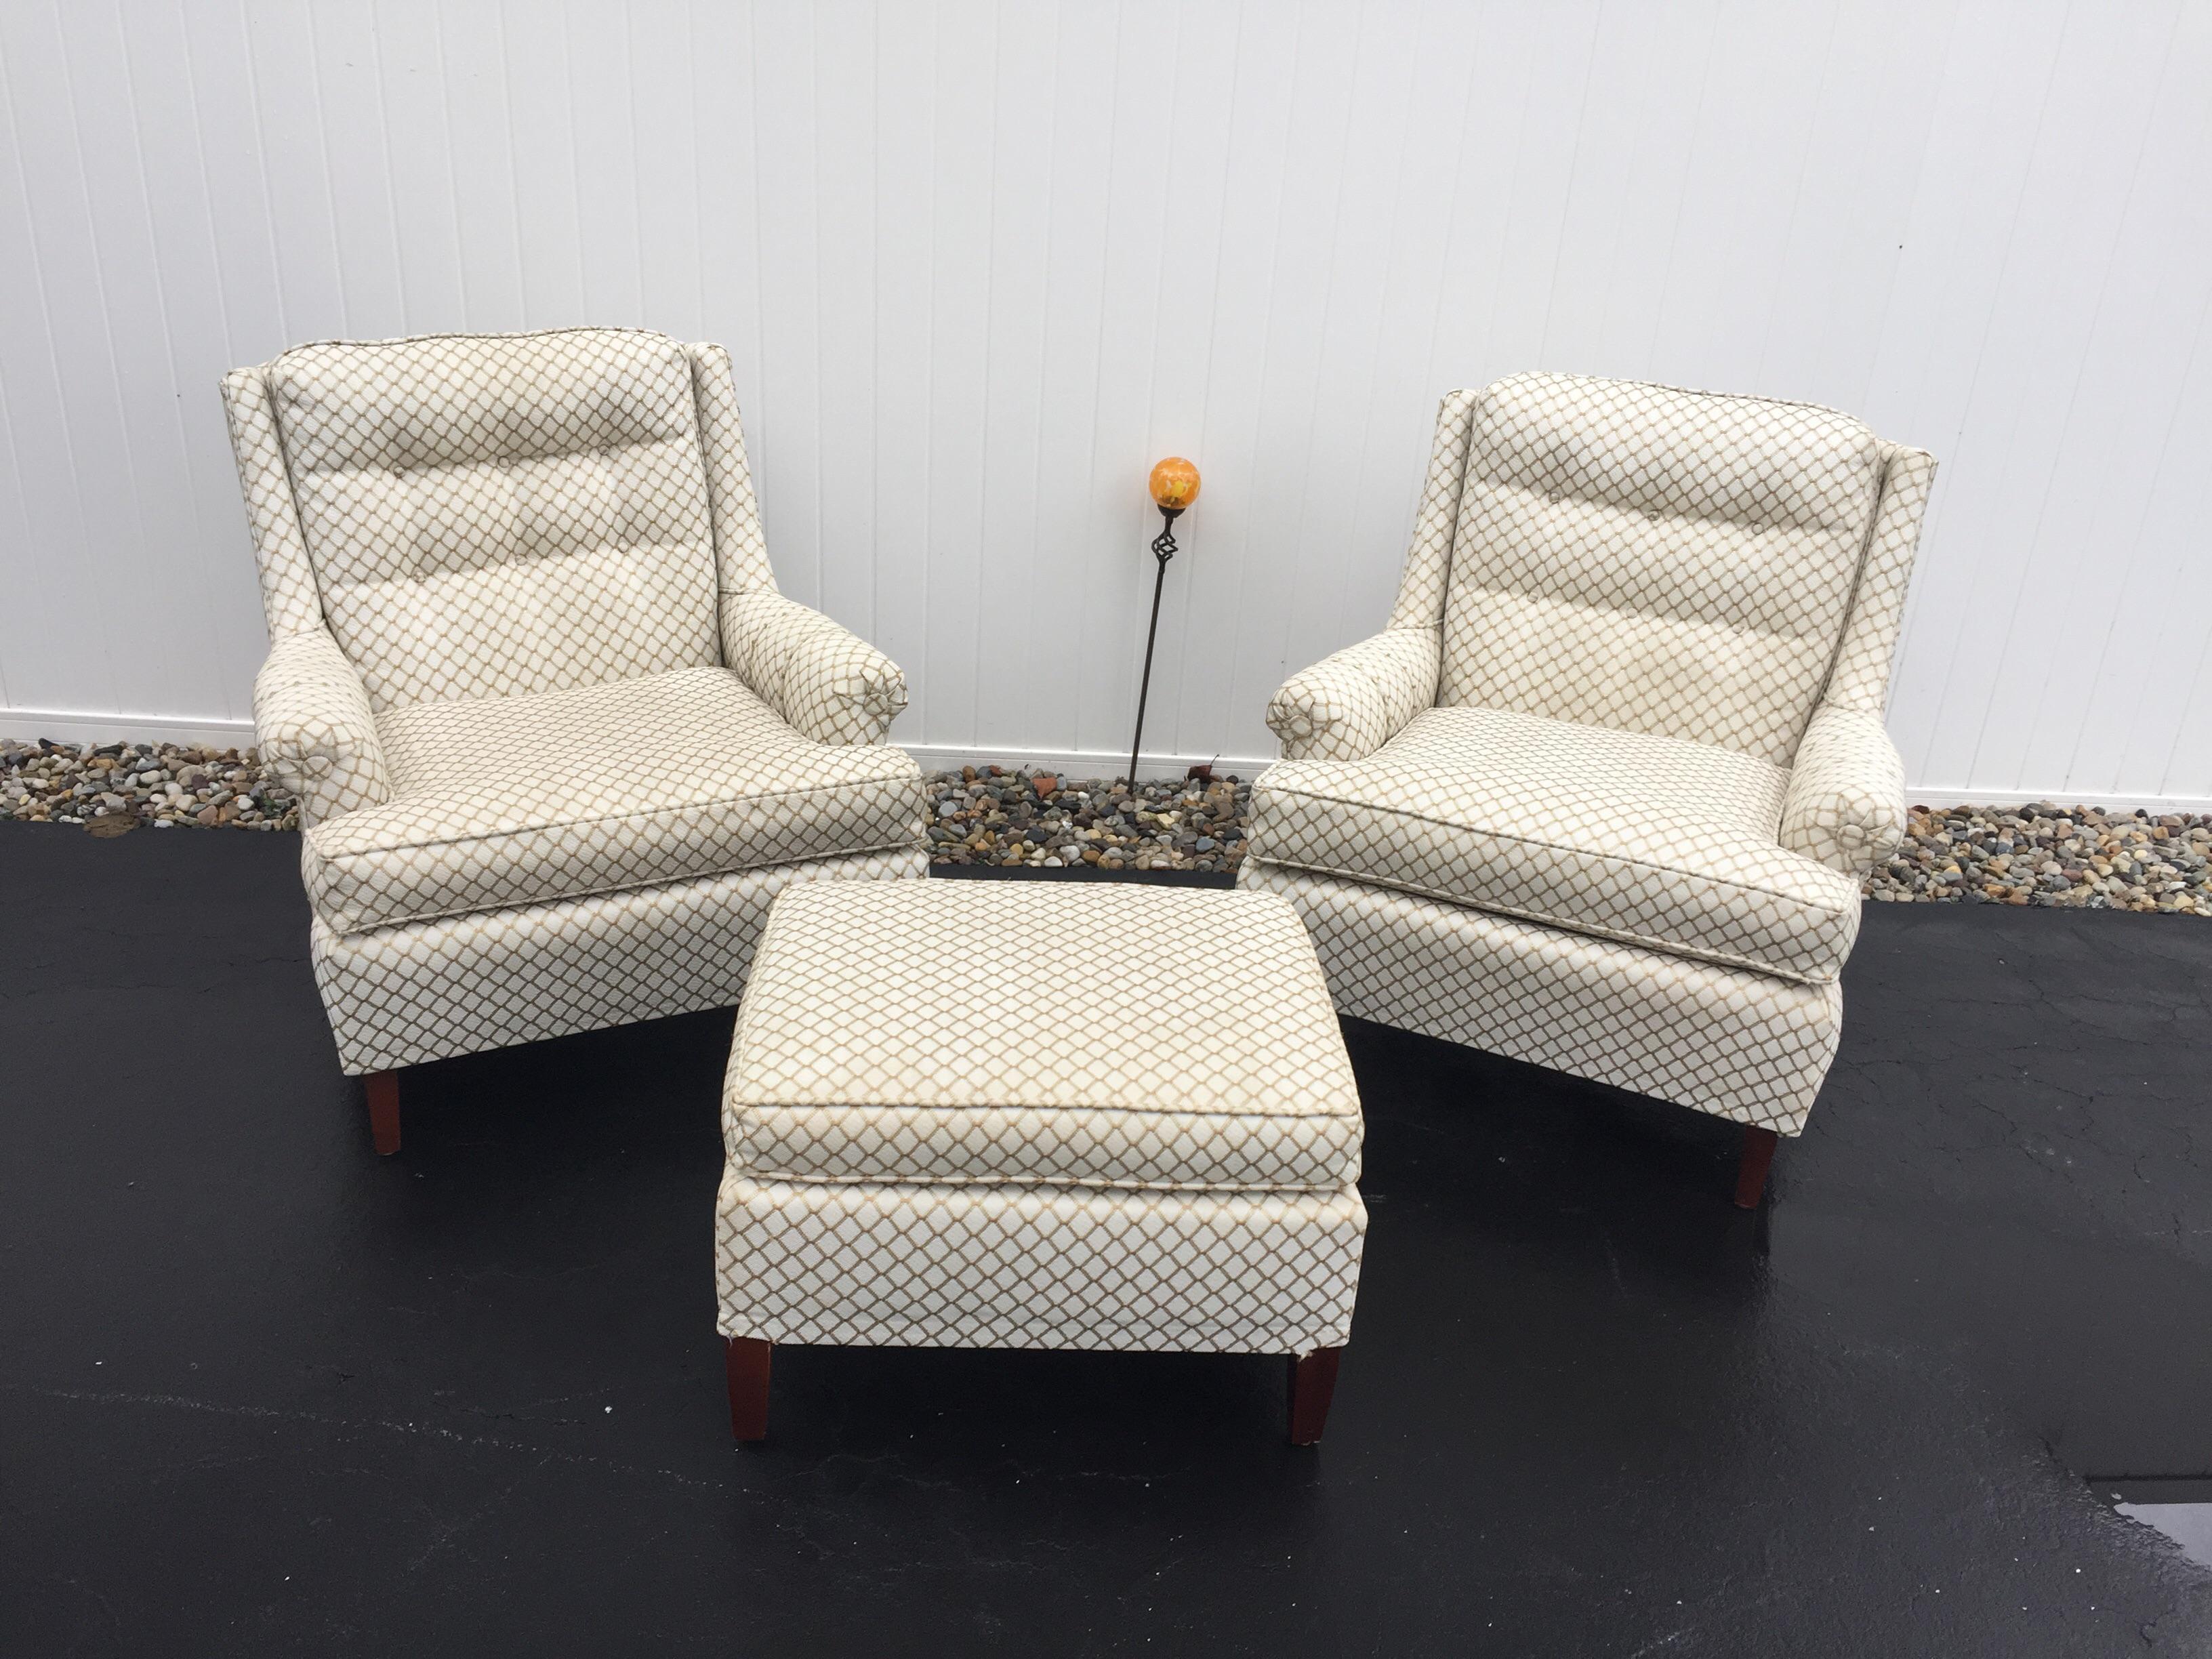 Vintage Hollywood Regency Chairs U0026 Ottoman   Set Of 3   Image 2 Of 11